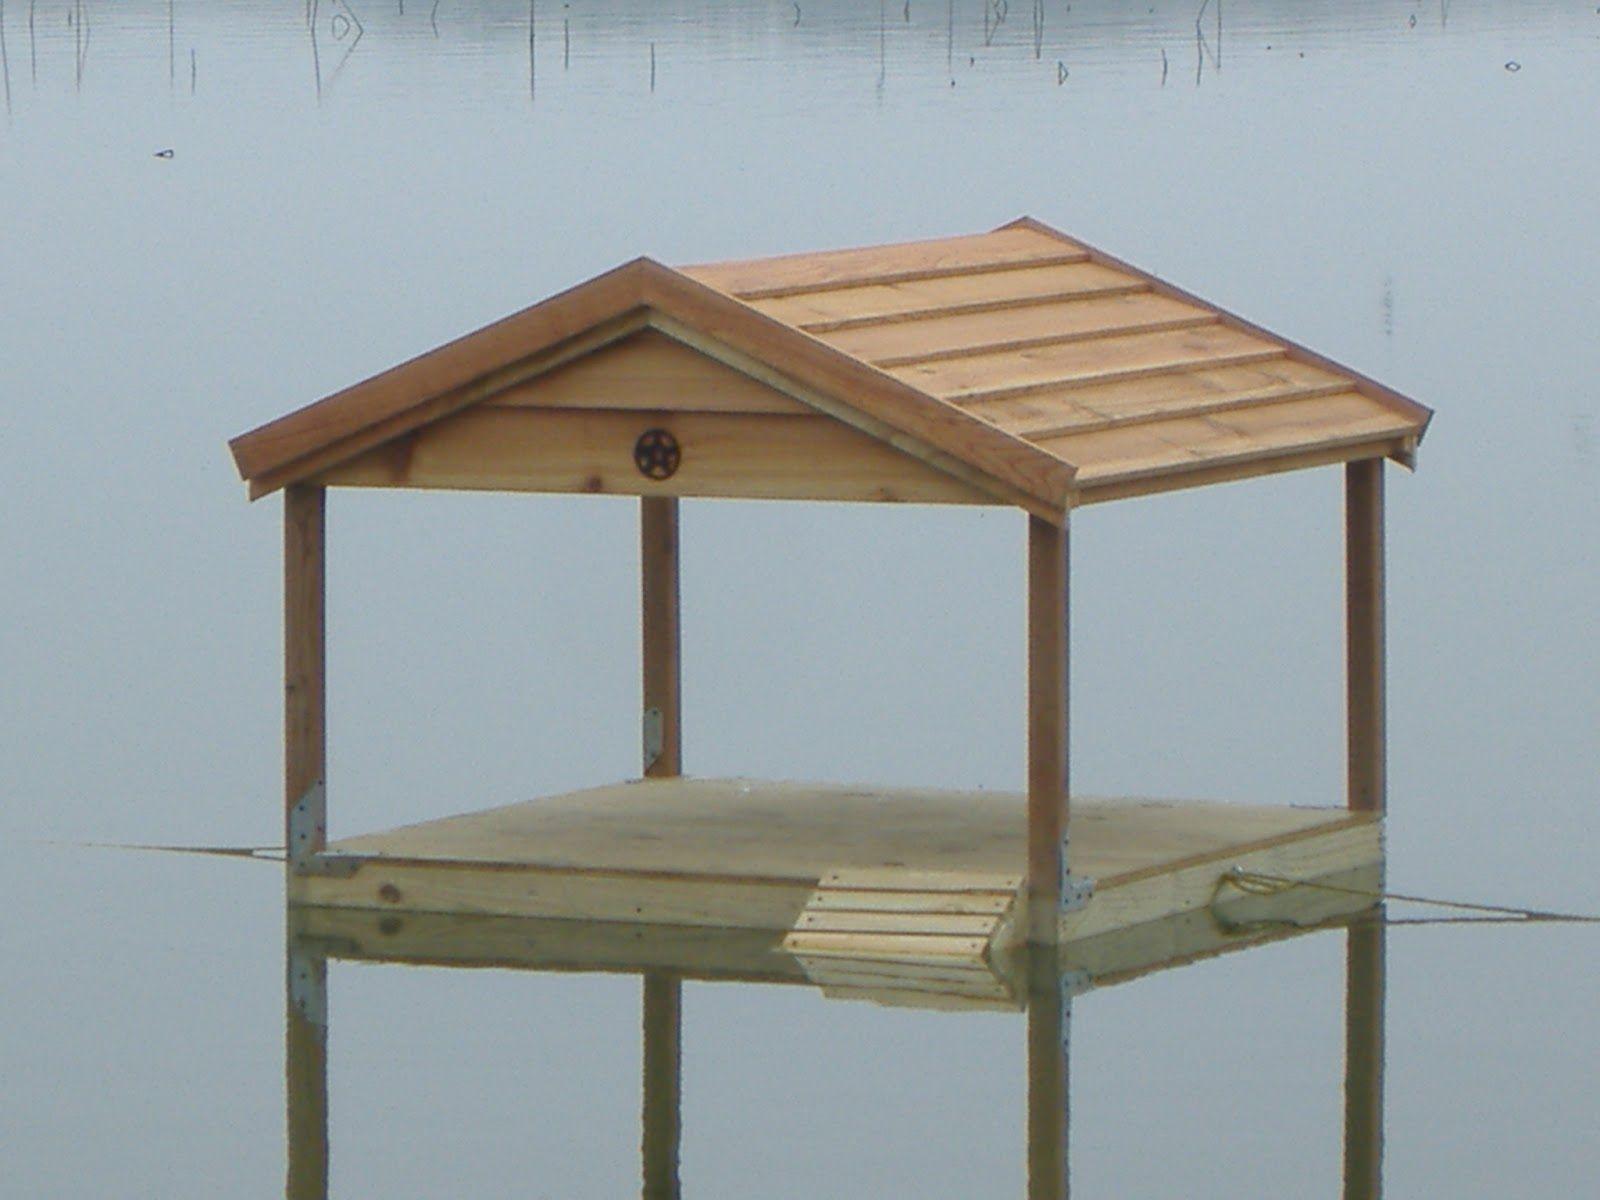 Custom floating duck house 005 jpg 1 600 1 200 pixels for Duck and goose houses